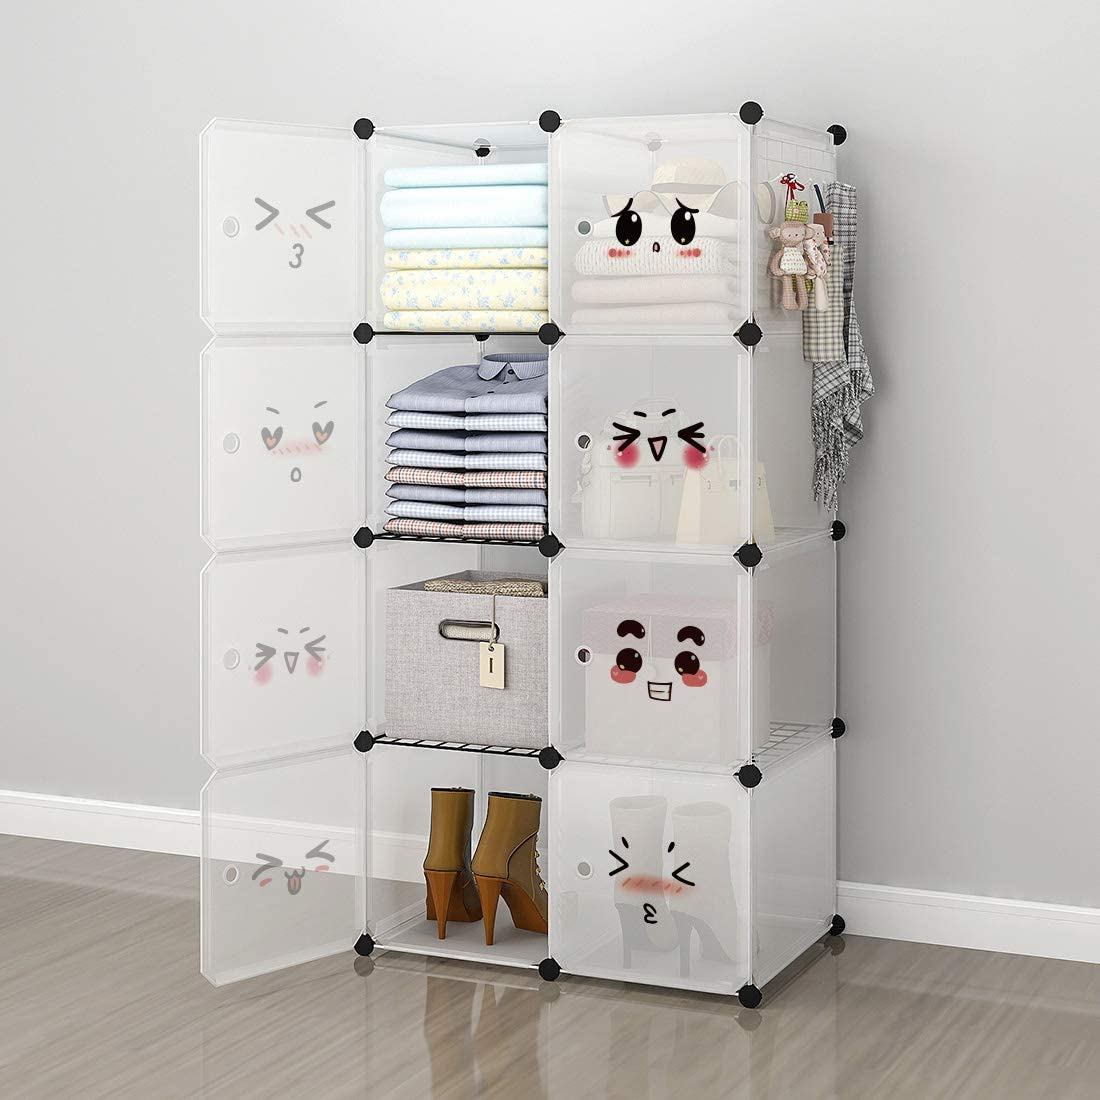 GEORGE&DANIS Portable Cube Storage, Clothes Wardrobe Closet Armoire Cabinet Plastic Dresser Bedroom Organizer, 14 inches Depth, 2x4 Tiers